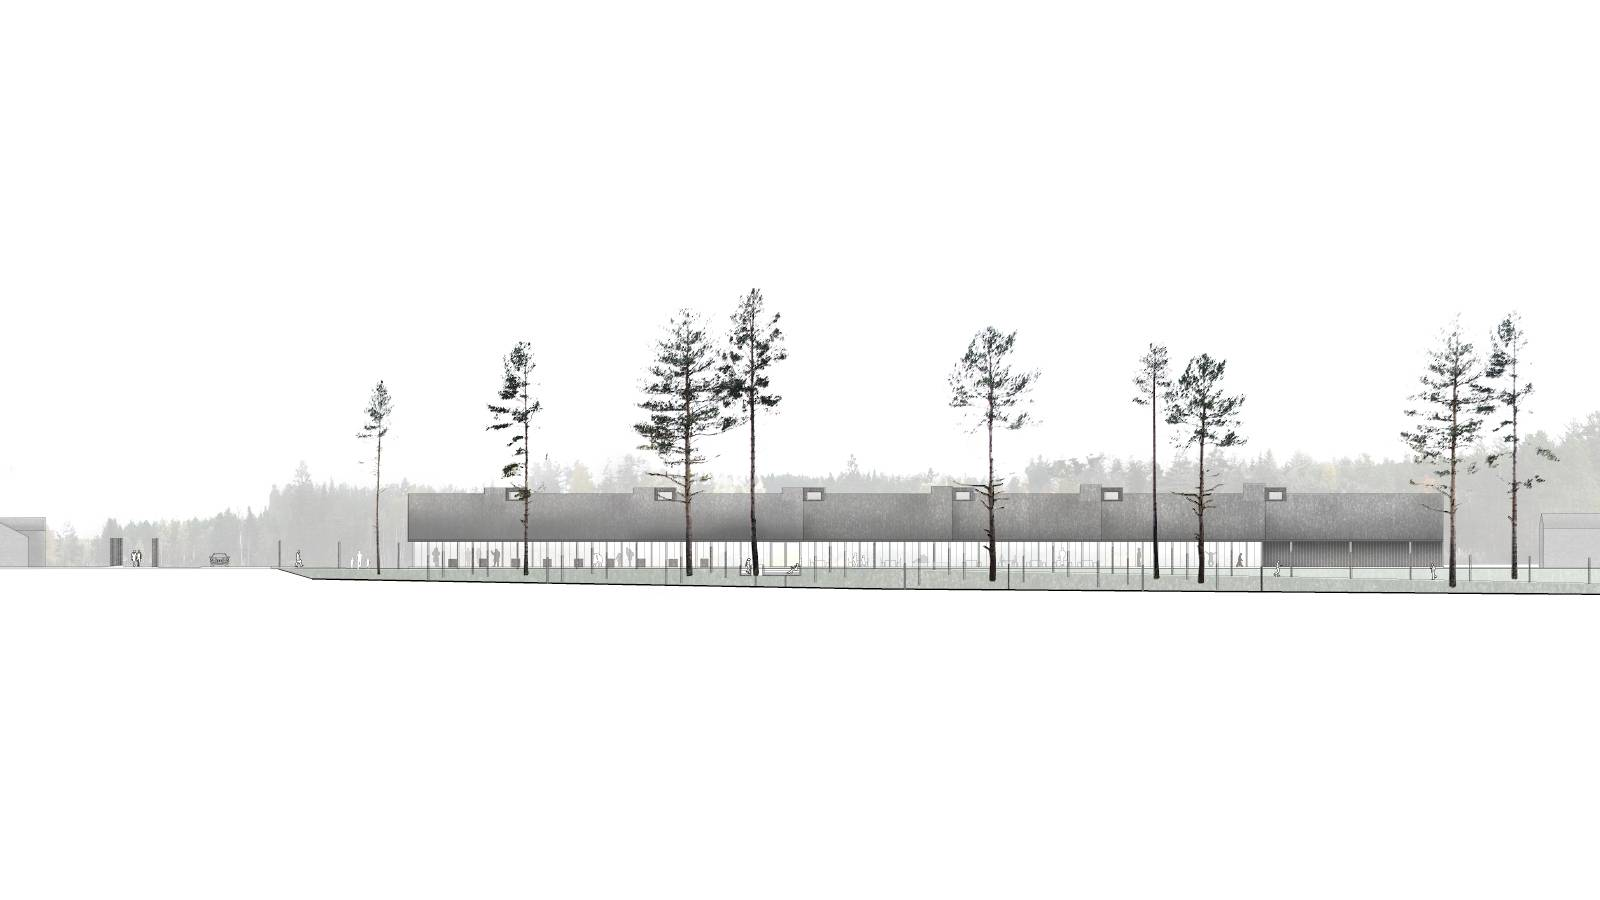 RIVERSIDE ELEVATION - Skogfinsk Museum - SPOL Architects